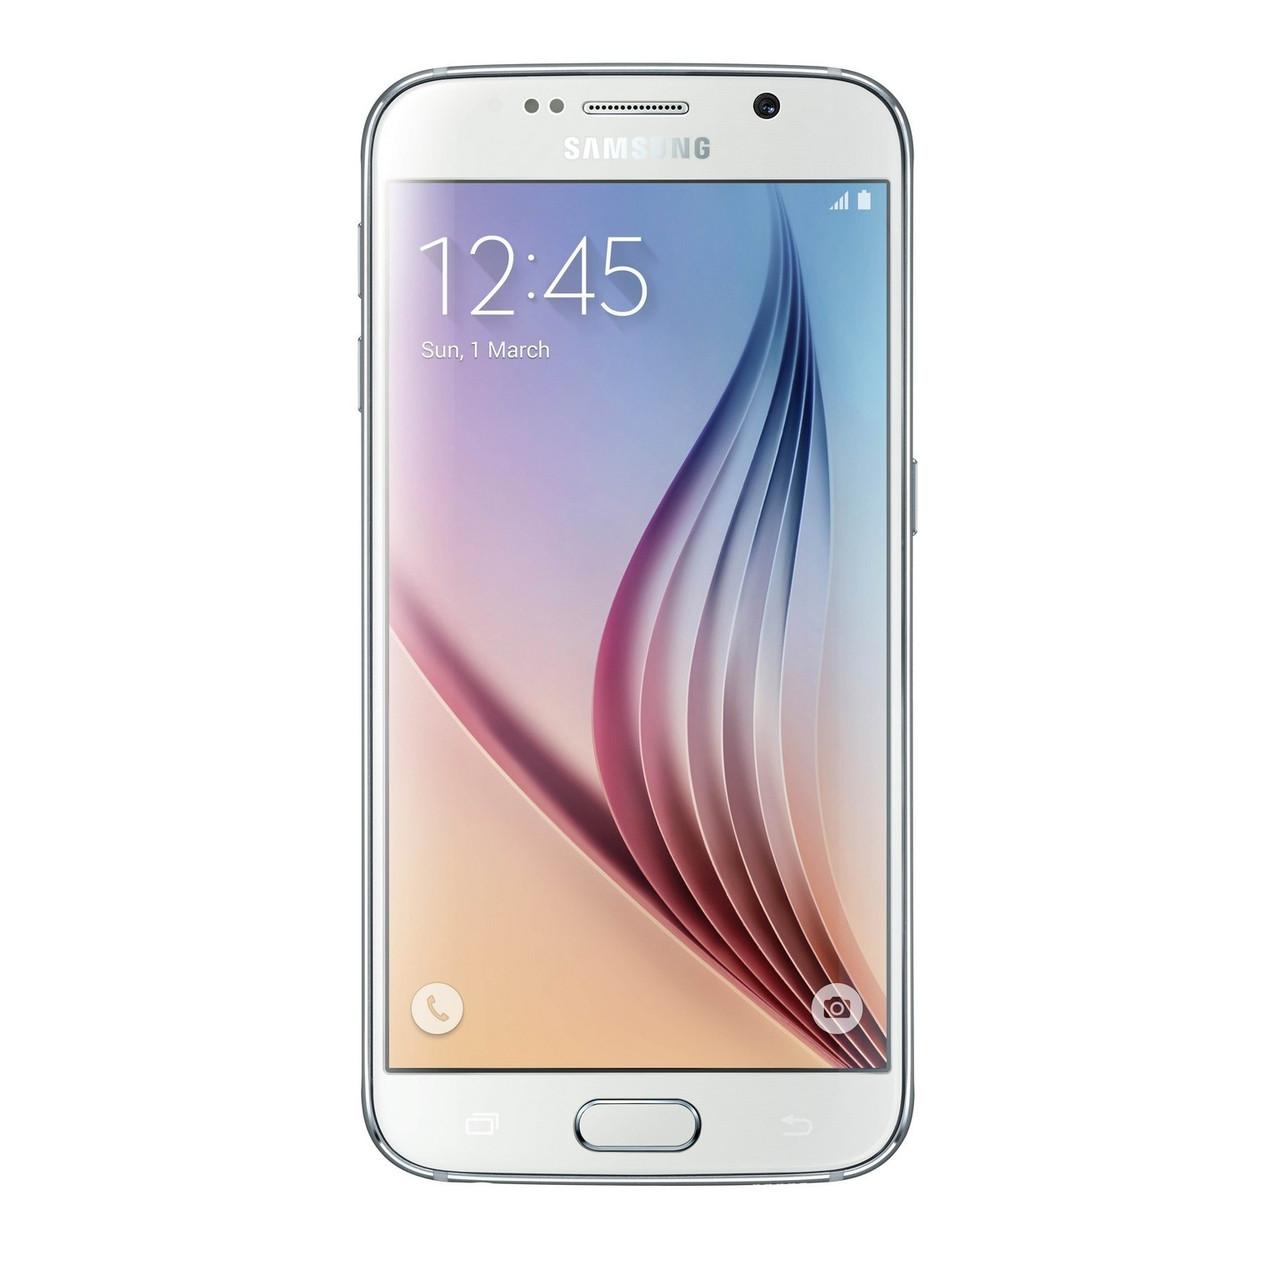 Samsung Galaxy S6 32GB (White Pearl)